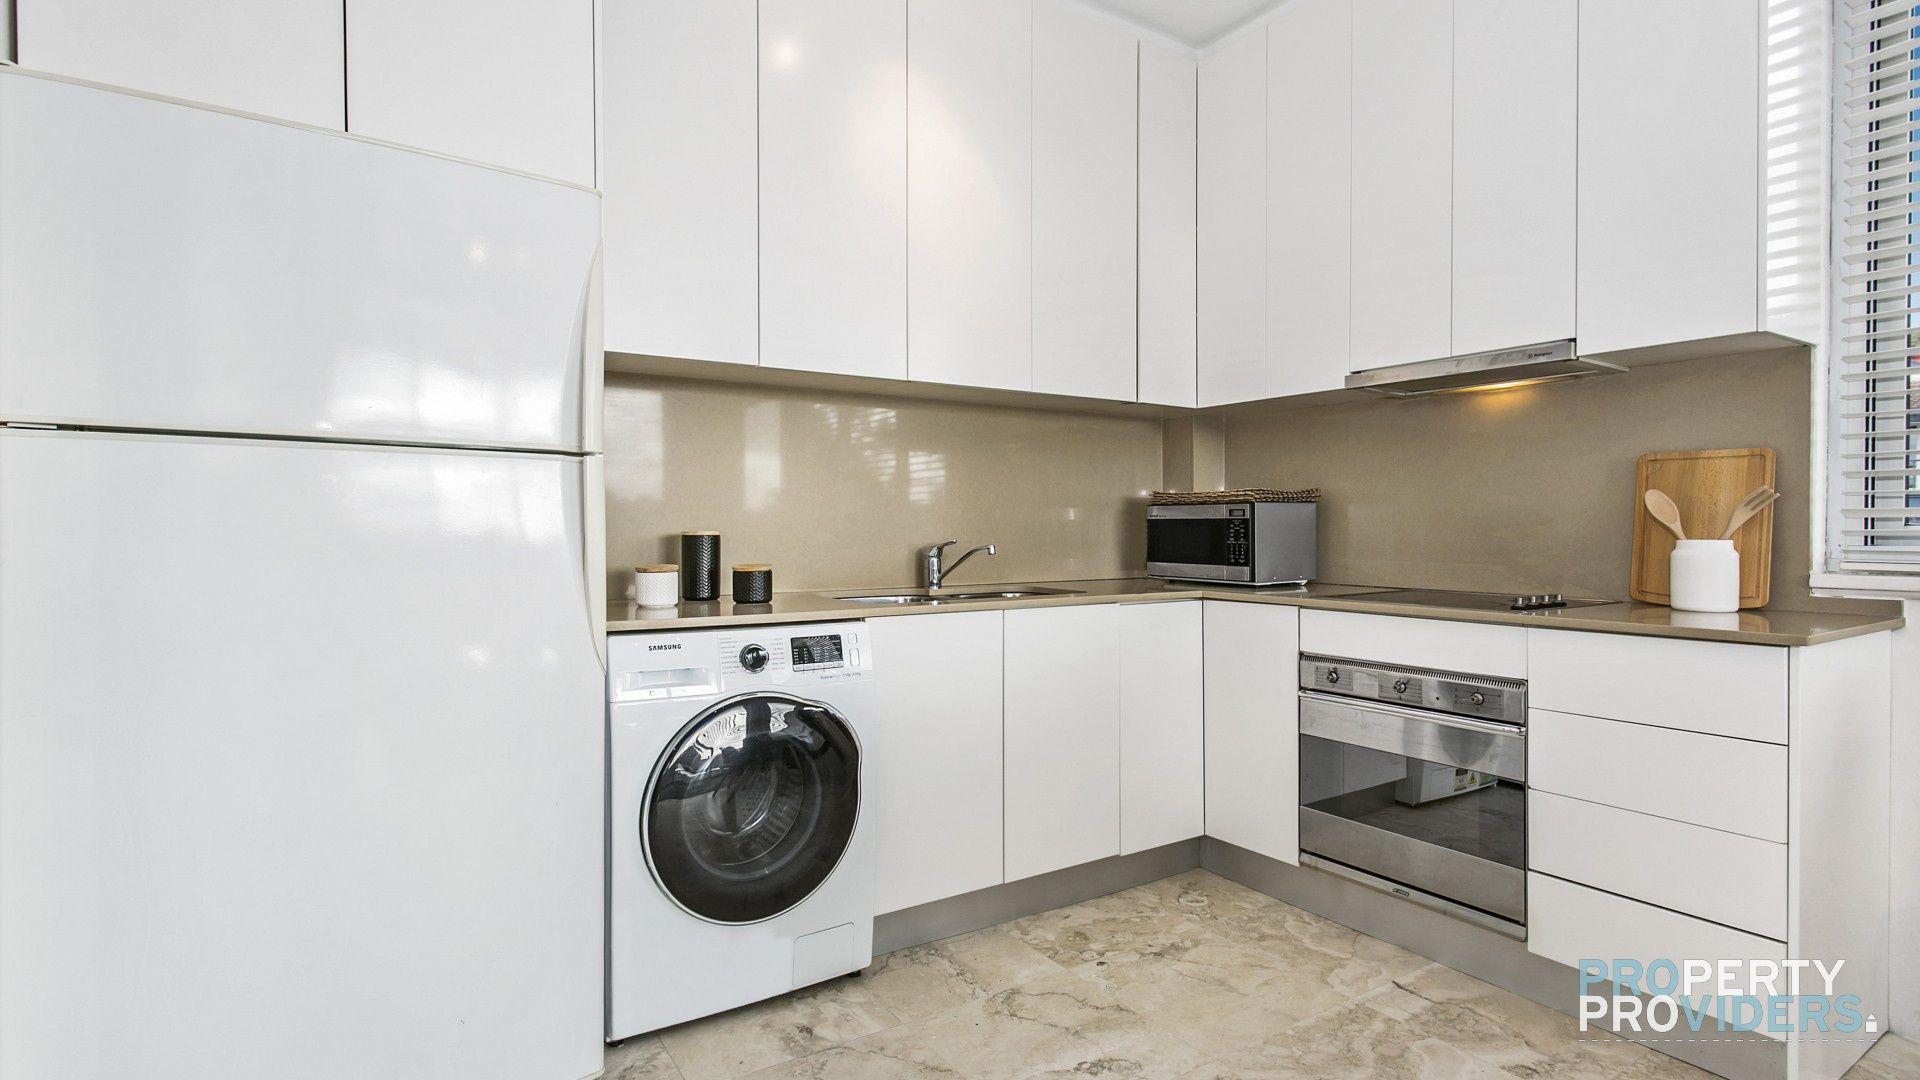 8/9 Arkland Street, Cammeray NSW 2062, Image 2